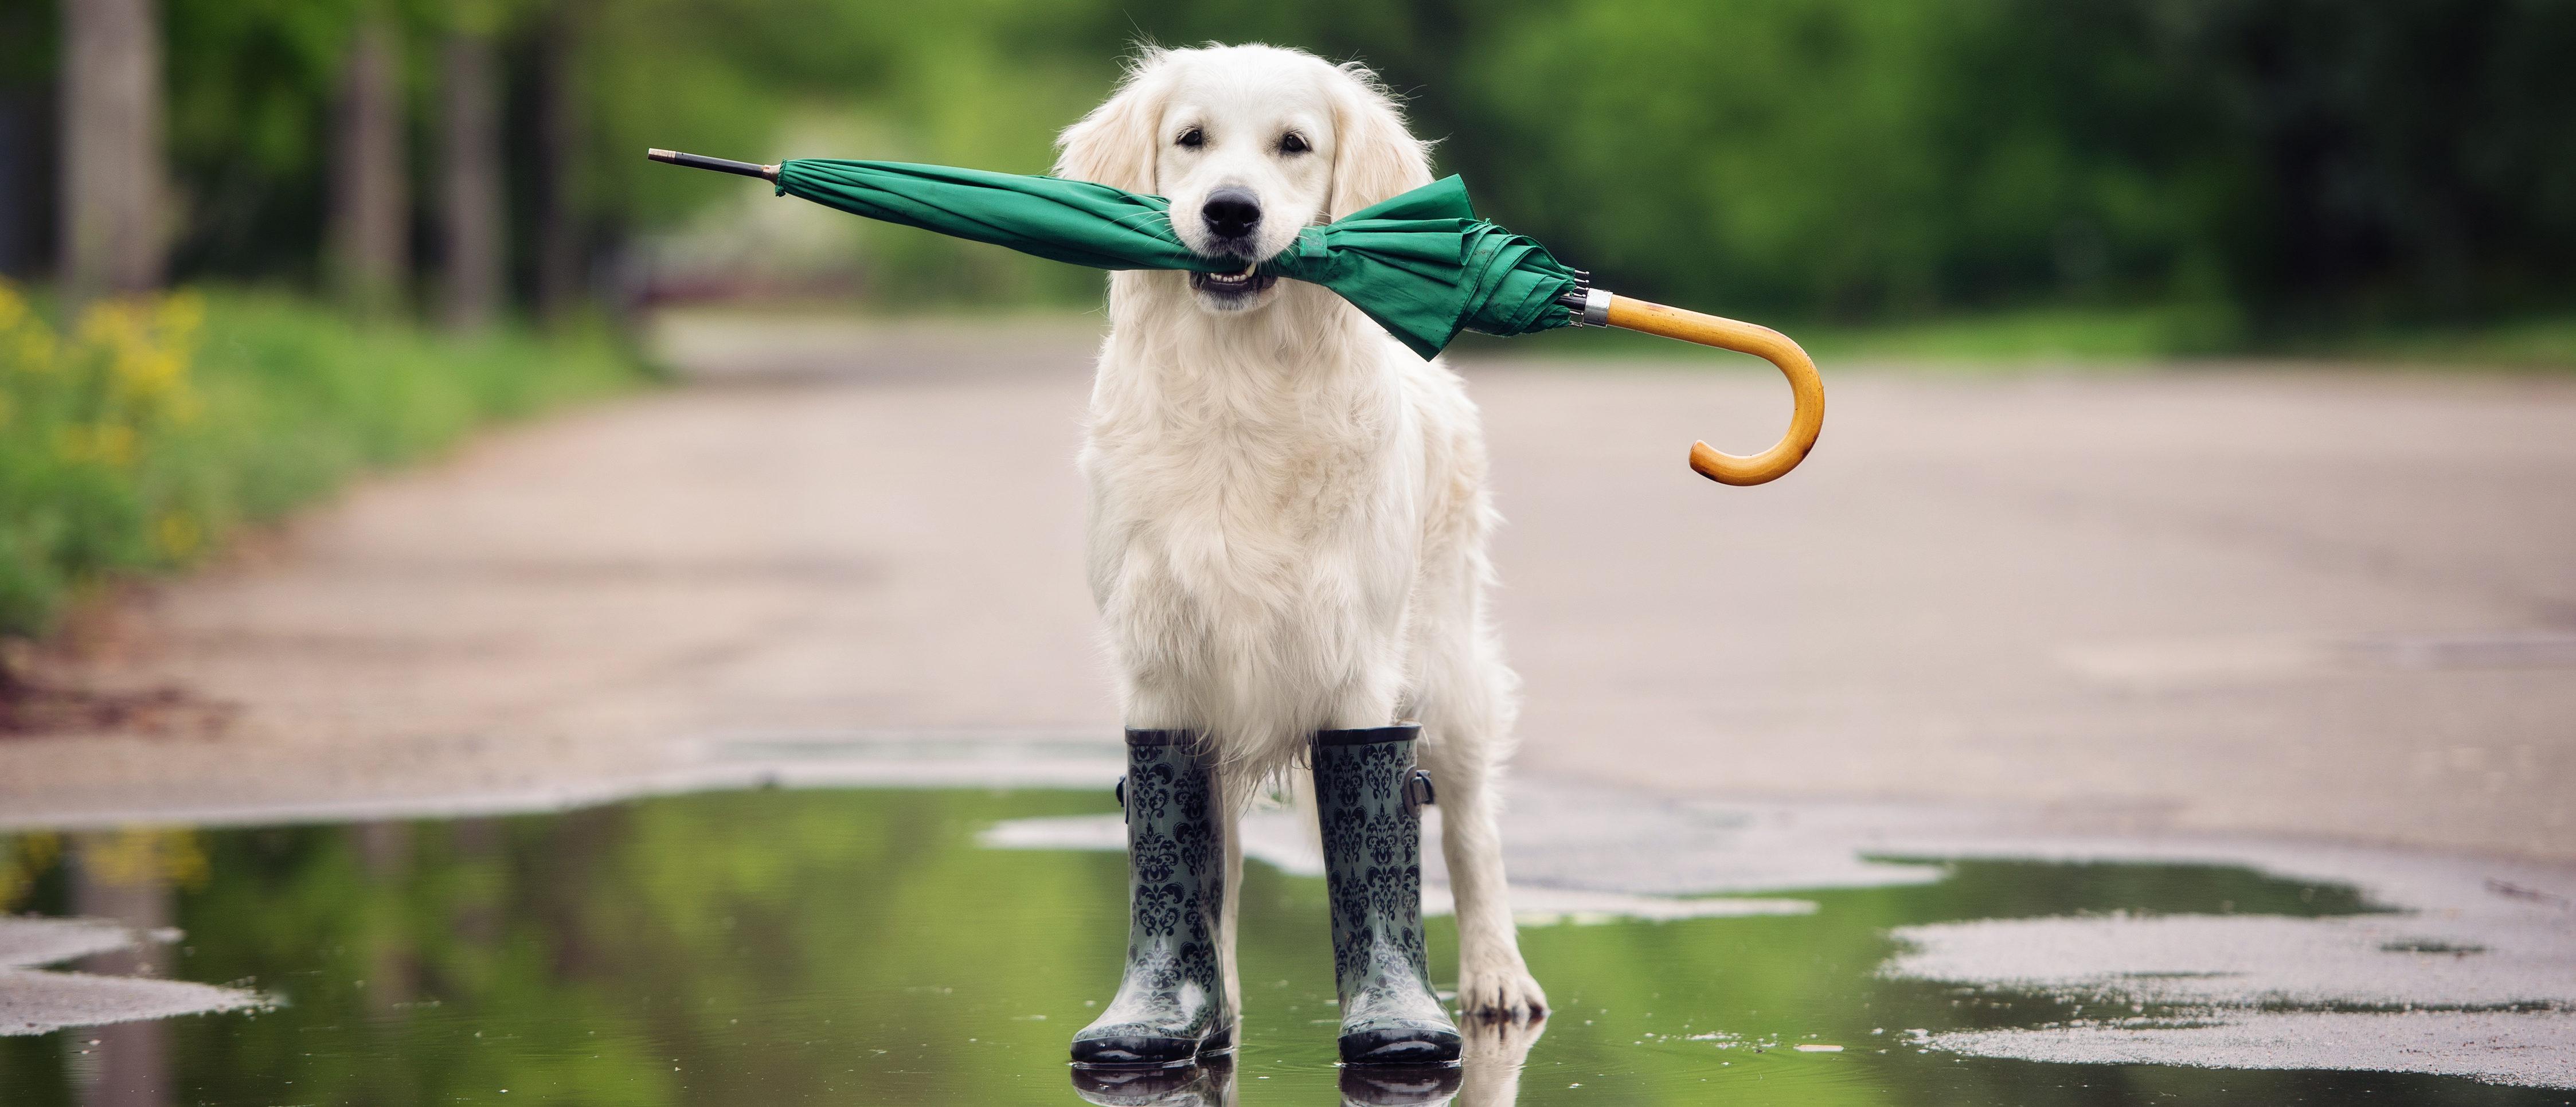 Dog_RainSource: otsphoto/Shutterstock